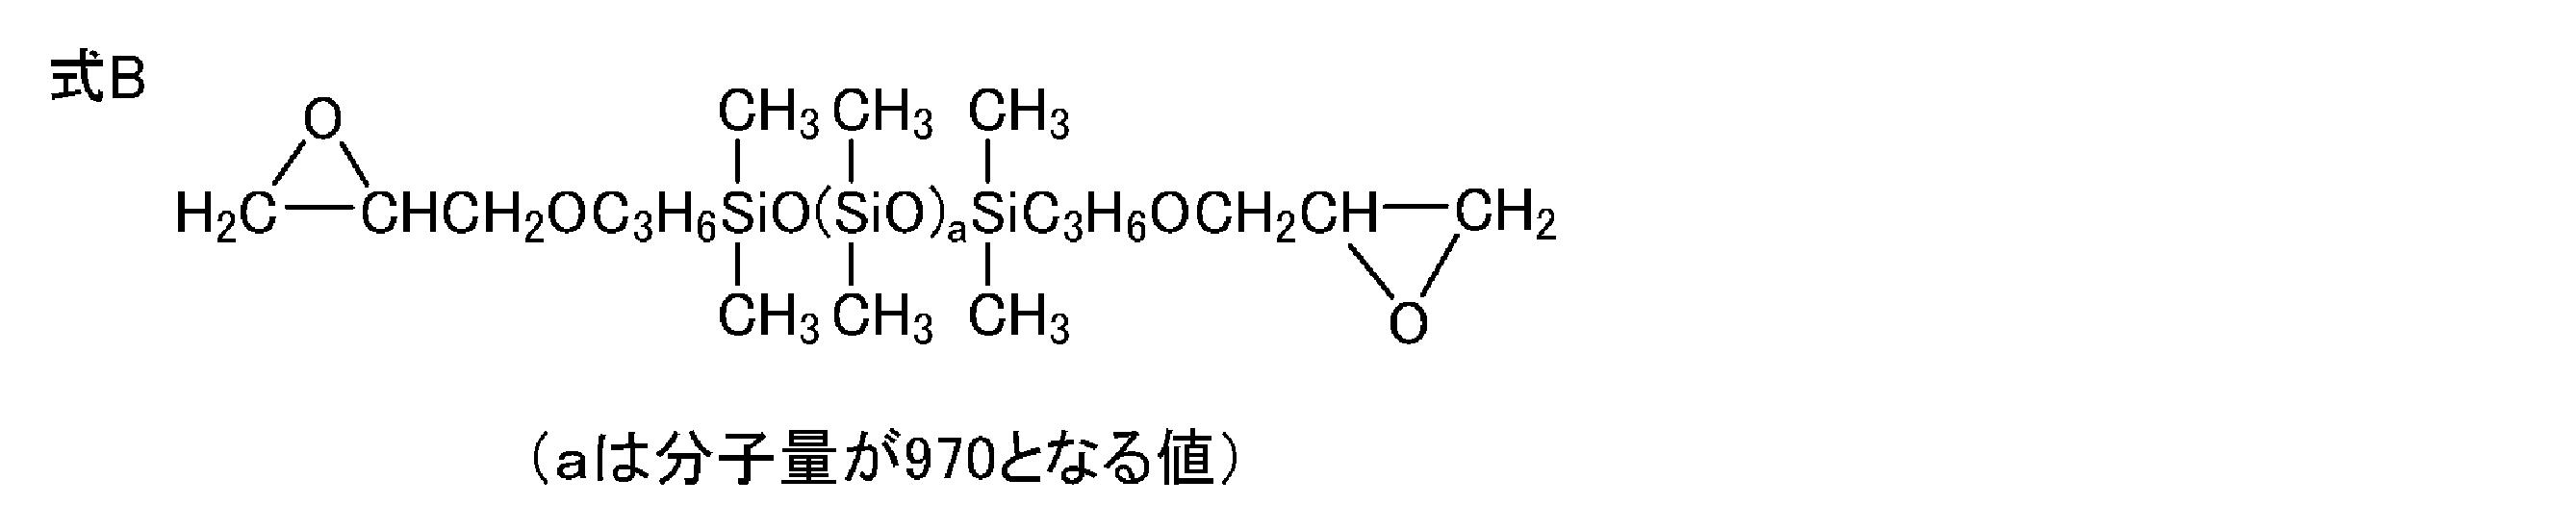 Figure JPOXMLDOC01-appb-I000020